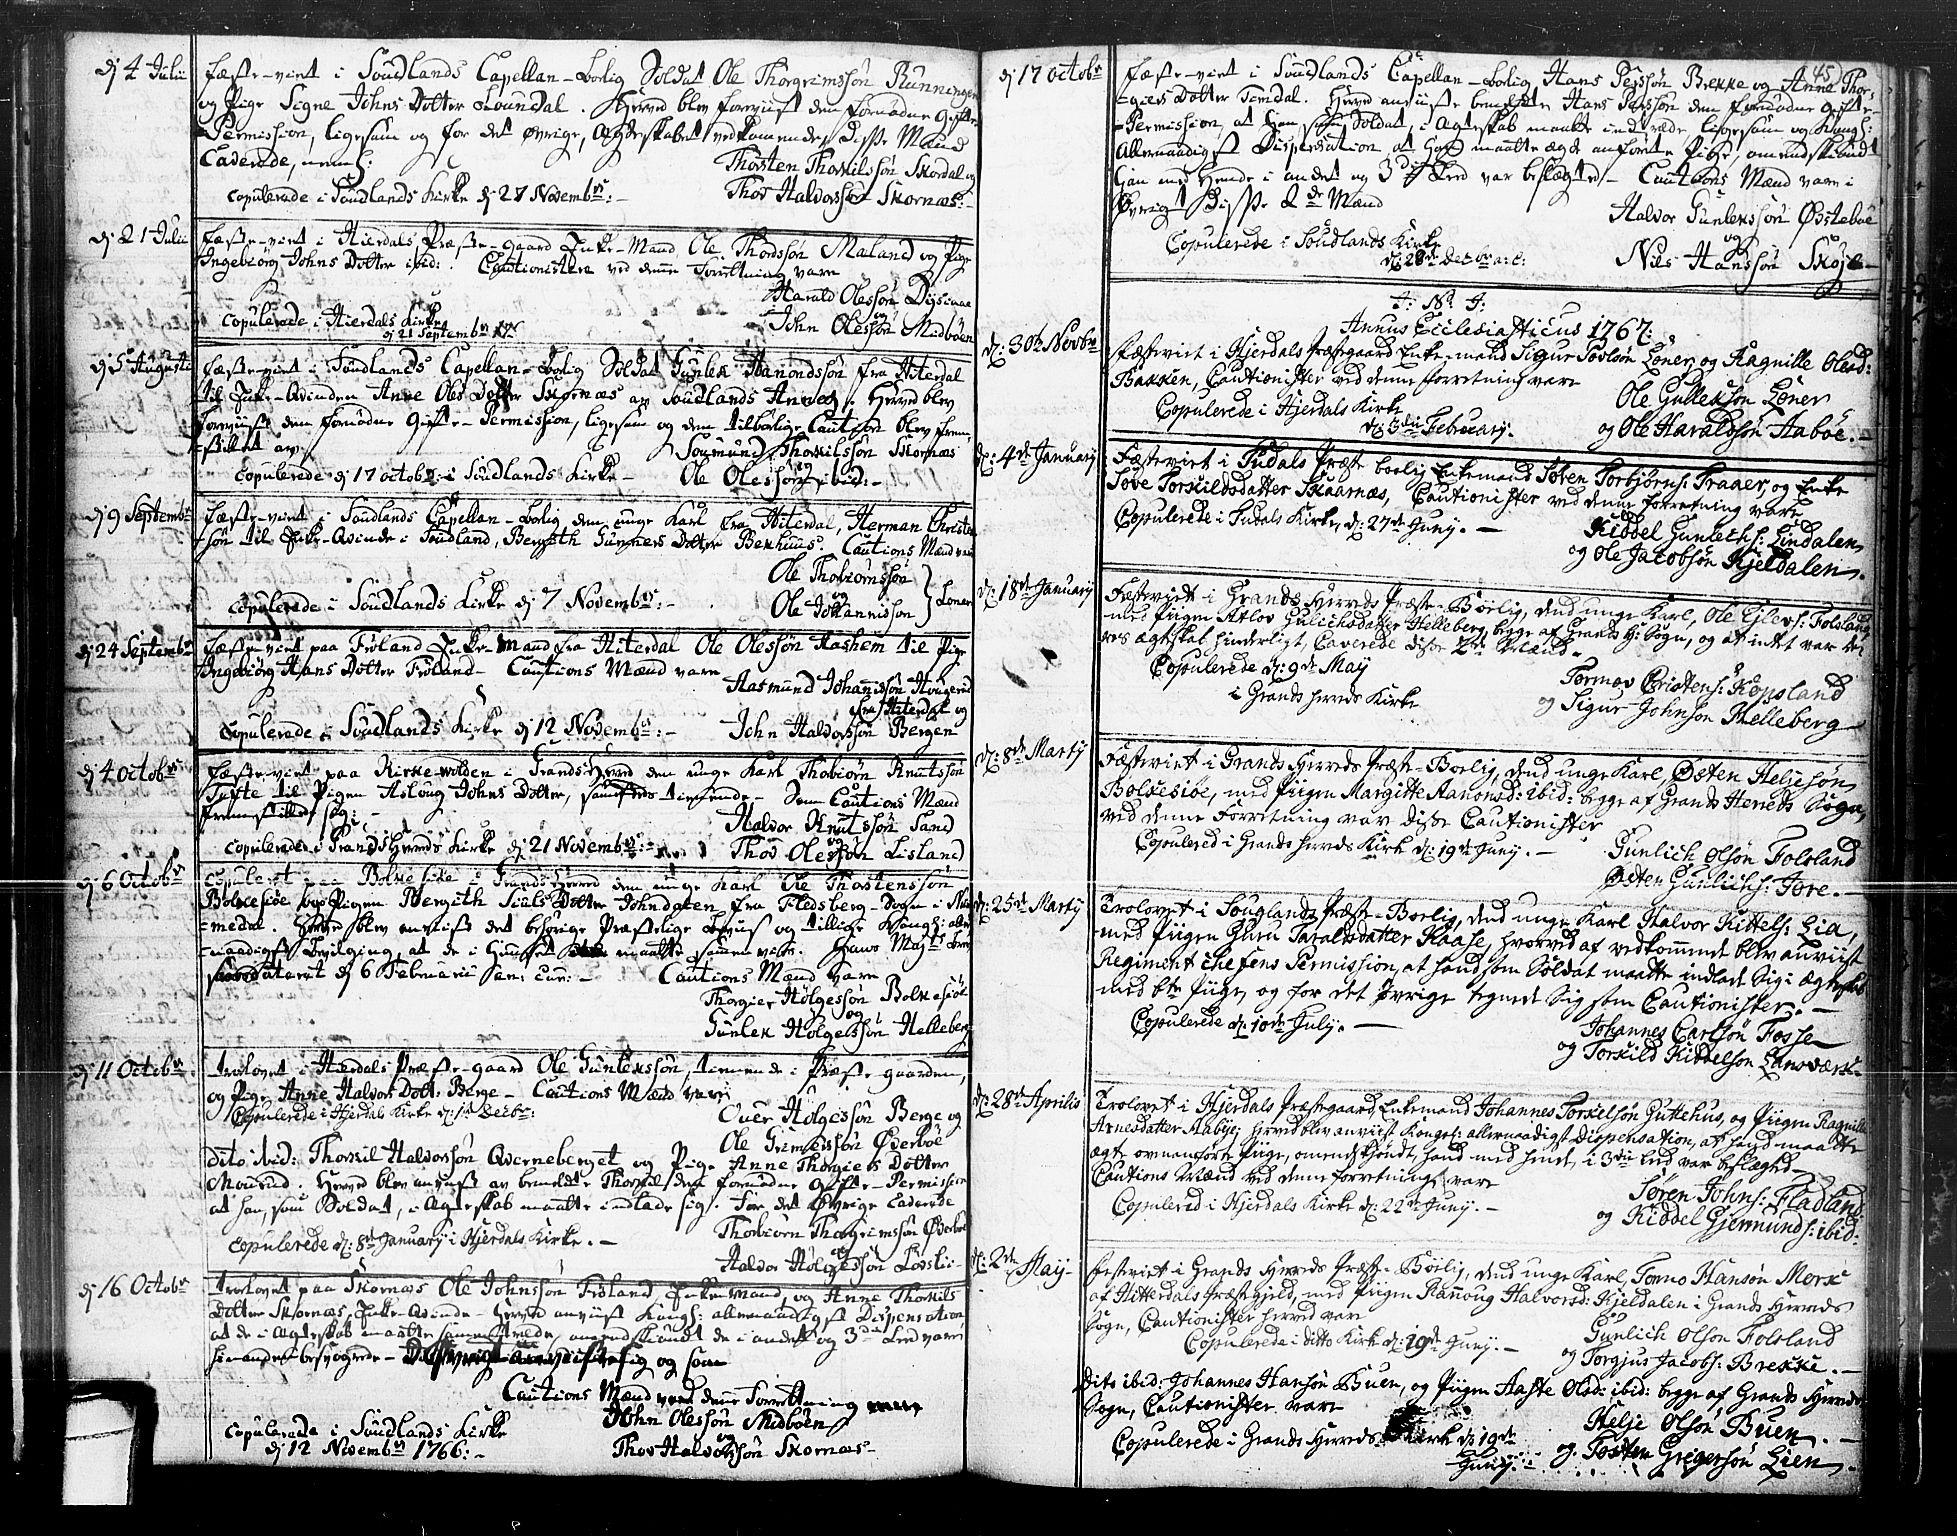 SAKO, Hjartdal kirkebøker, F/Fa/L0004: Ministerialbok nr. I 4, 1727-1795, s. 45